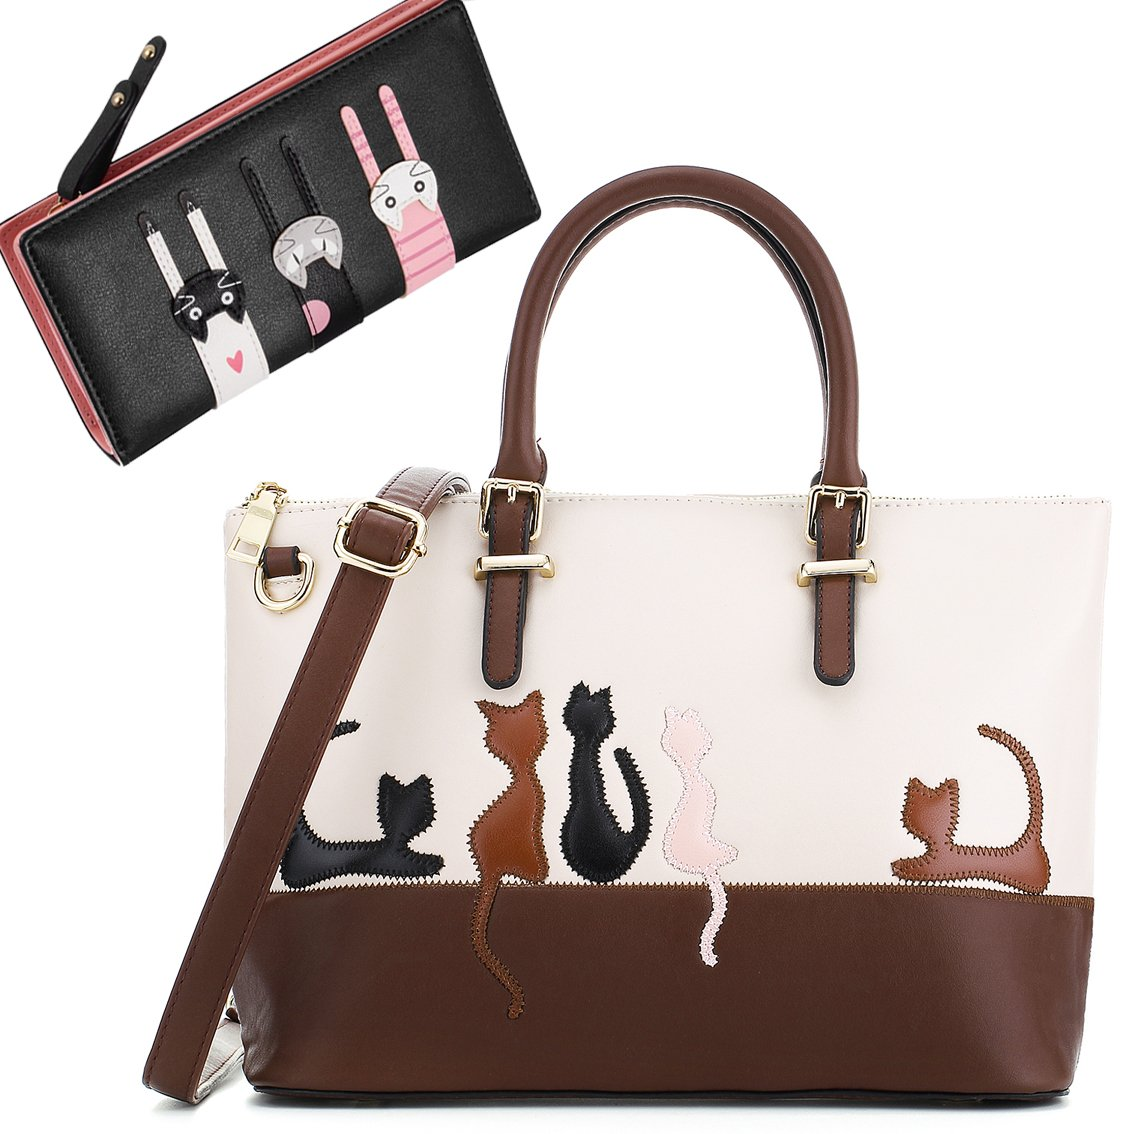 Cat Purses and Handbags for Women Cute Leather Wallet Satchel Tote Bag (Beige-Black)